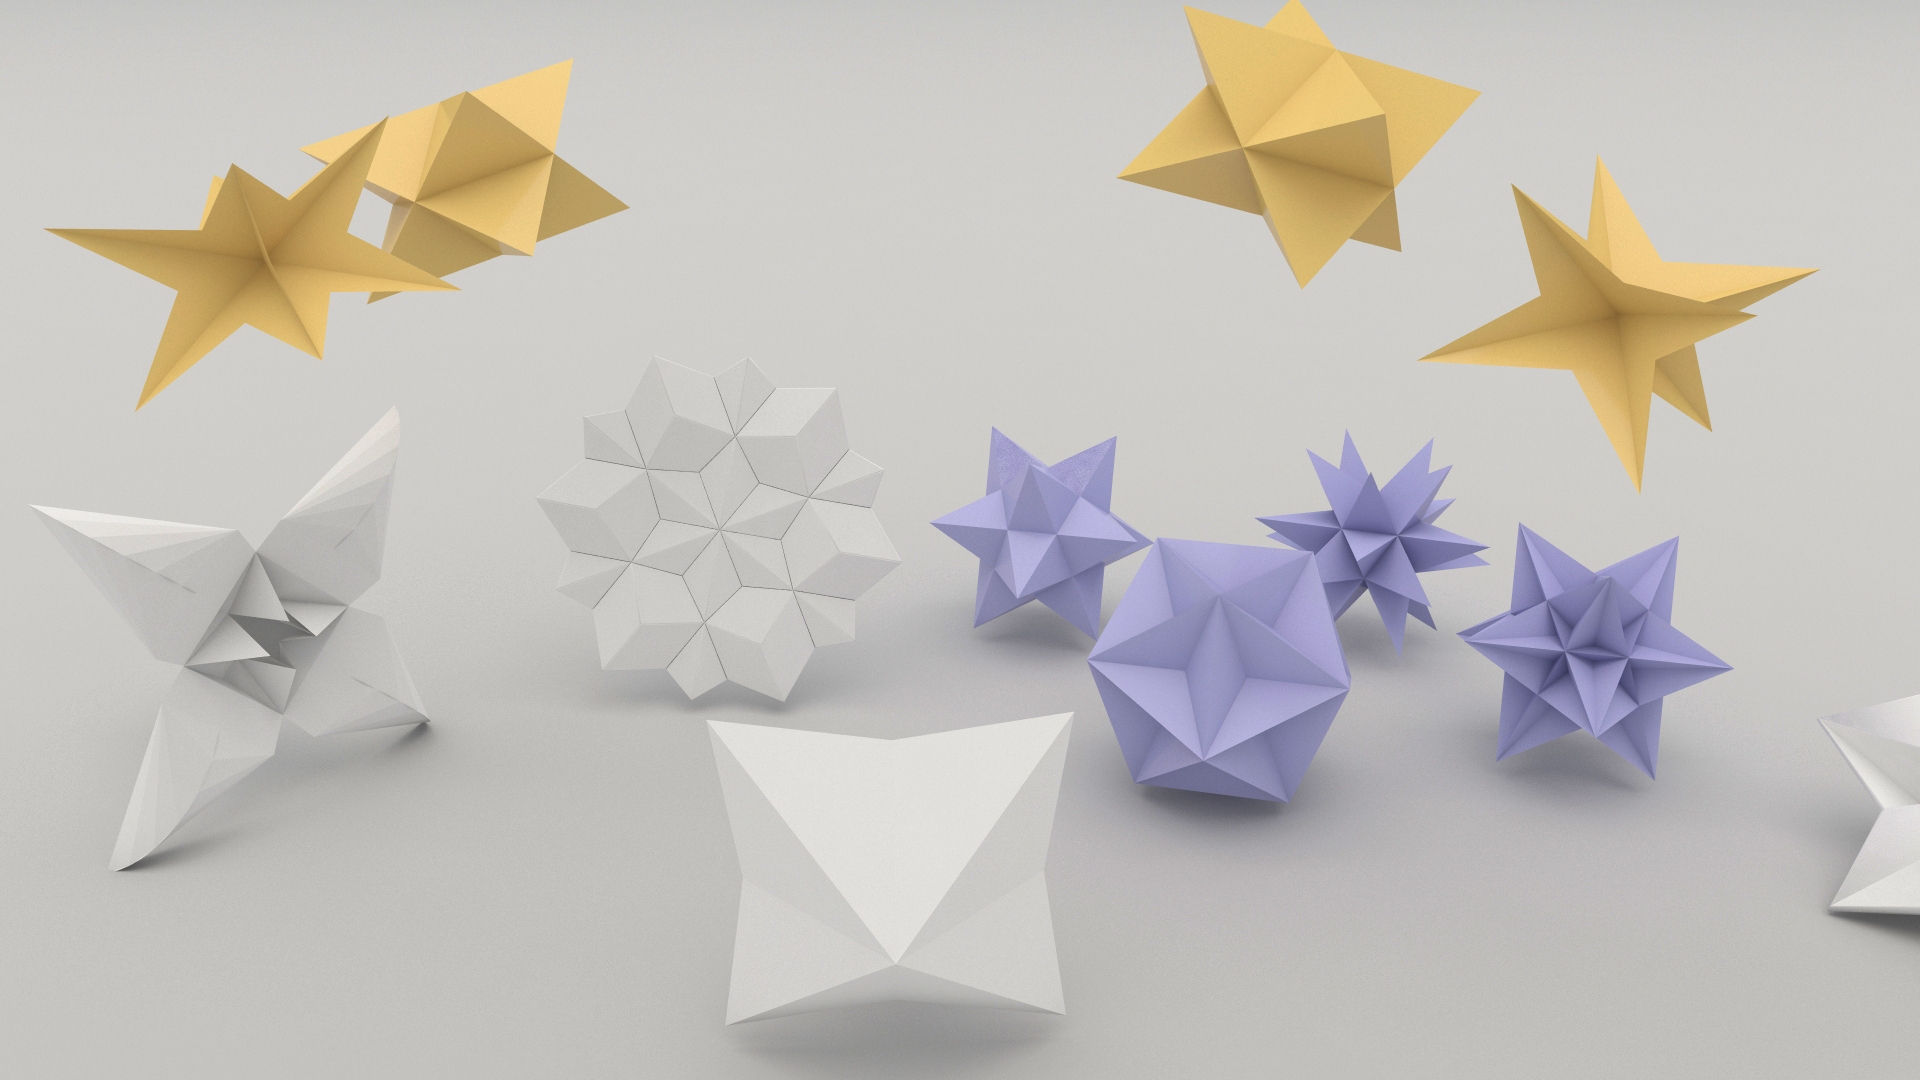 Paper flower origami 3d model highend3dcom psychologyarticlesfo paper flower origami 3d model highend3dcom mightylinksfo